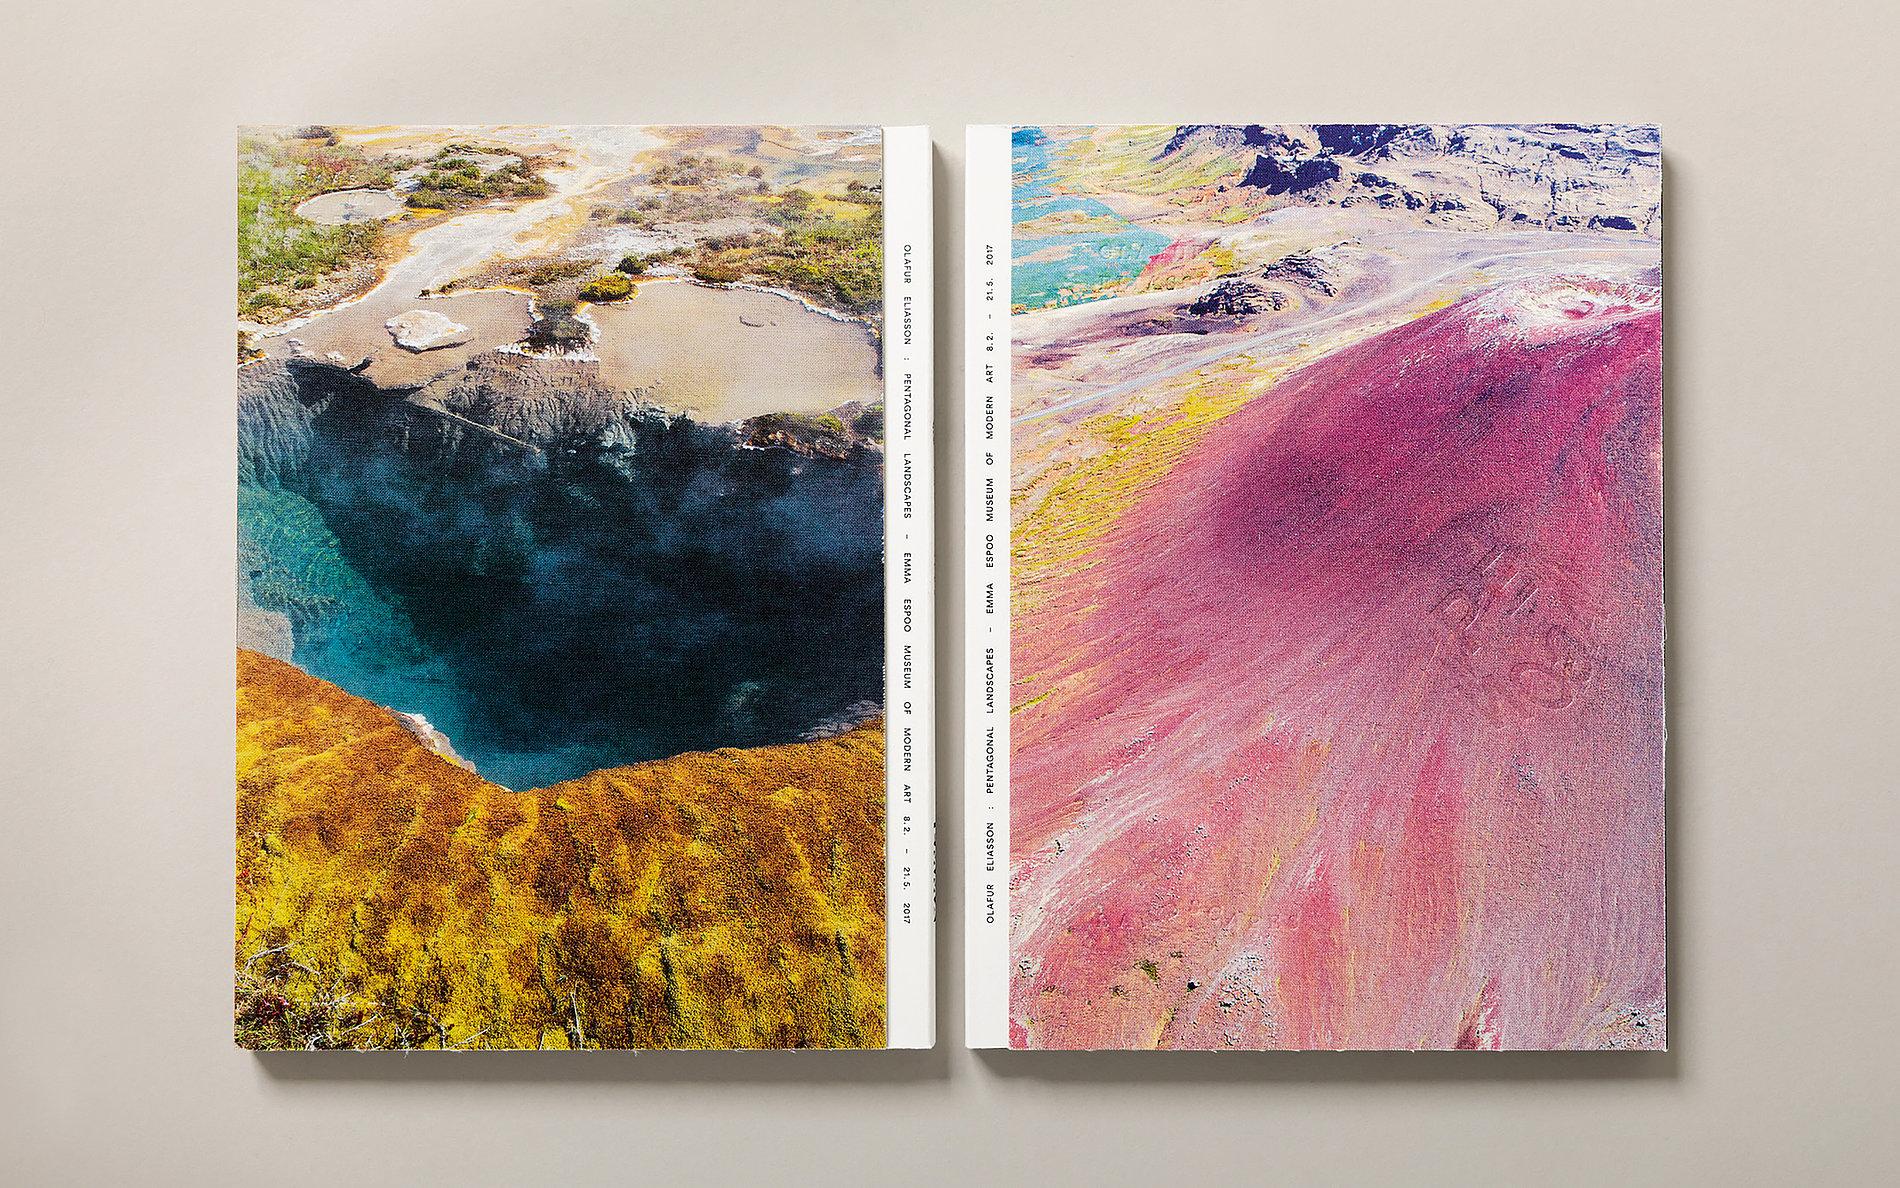 Olafur Eliasson: Pentagonal Landscapes | Red Dot Design Award